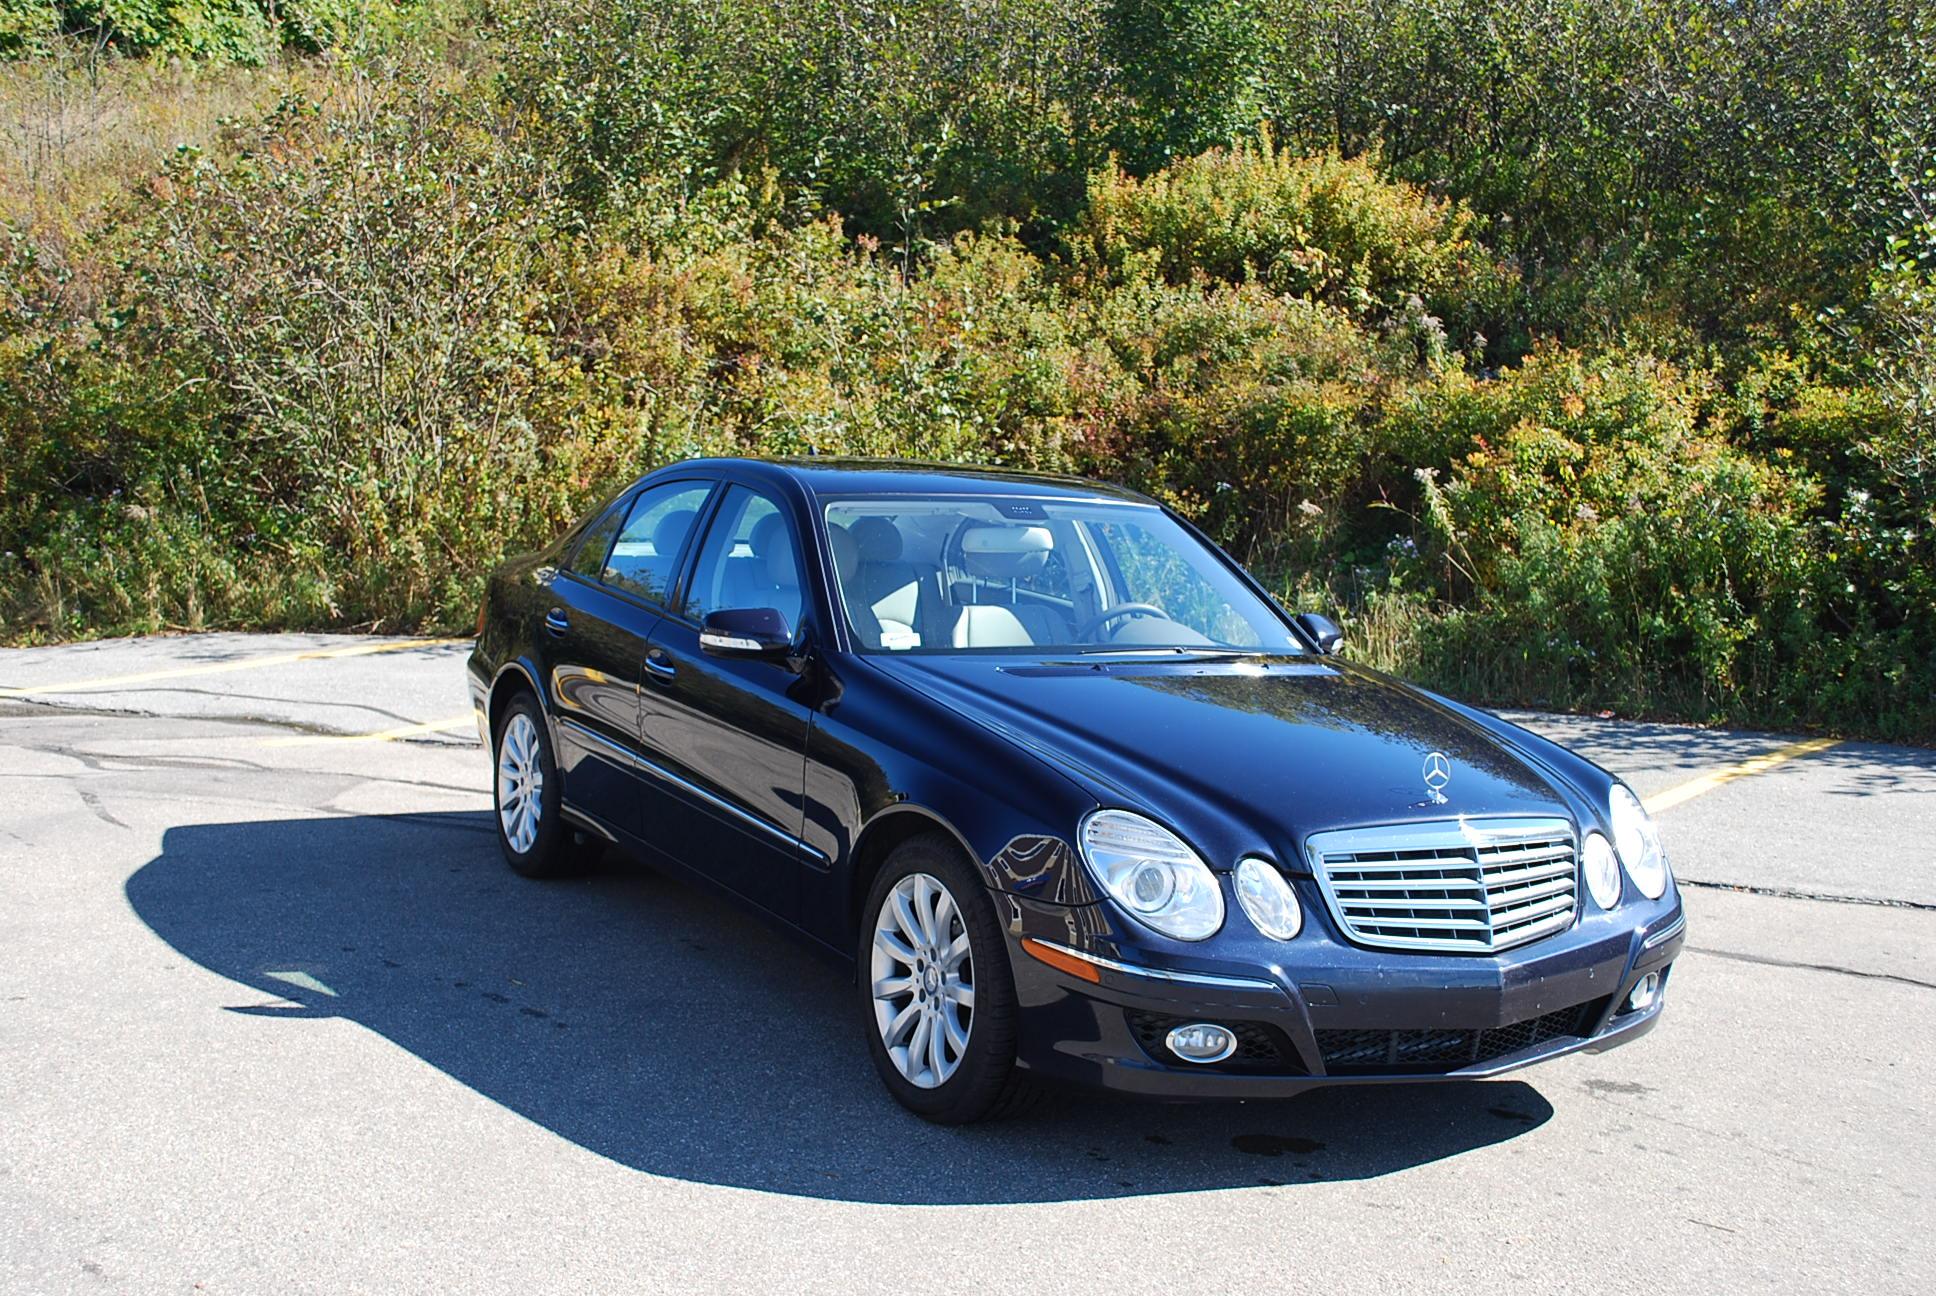 Used 2008 Mercedes Benz E 300 For Sale | Saint John, NB